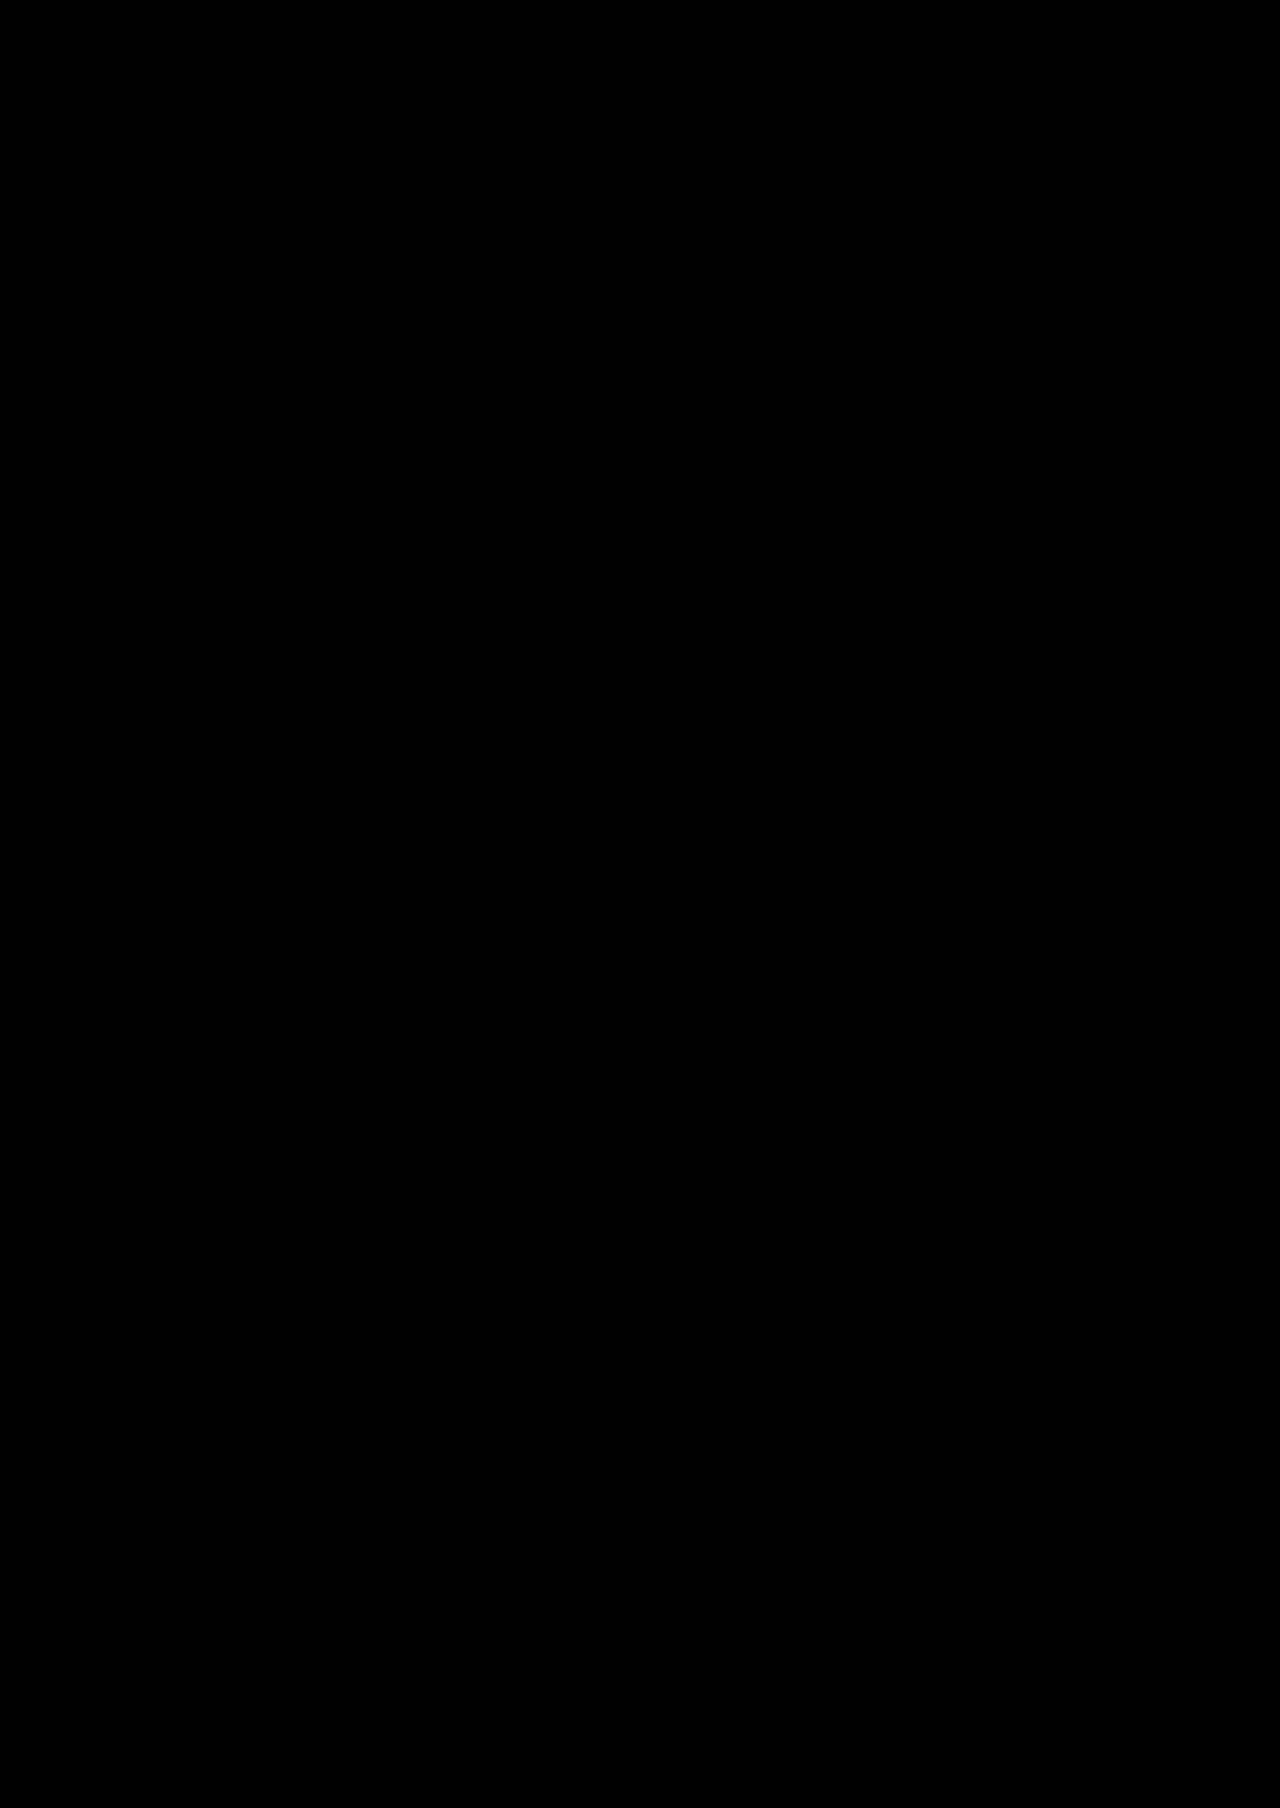 Kimetsu no Urabon - RAPE OF DEMON SLAYER 1